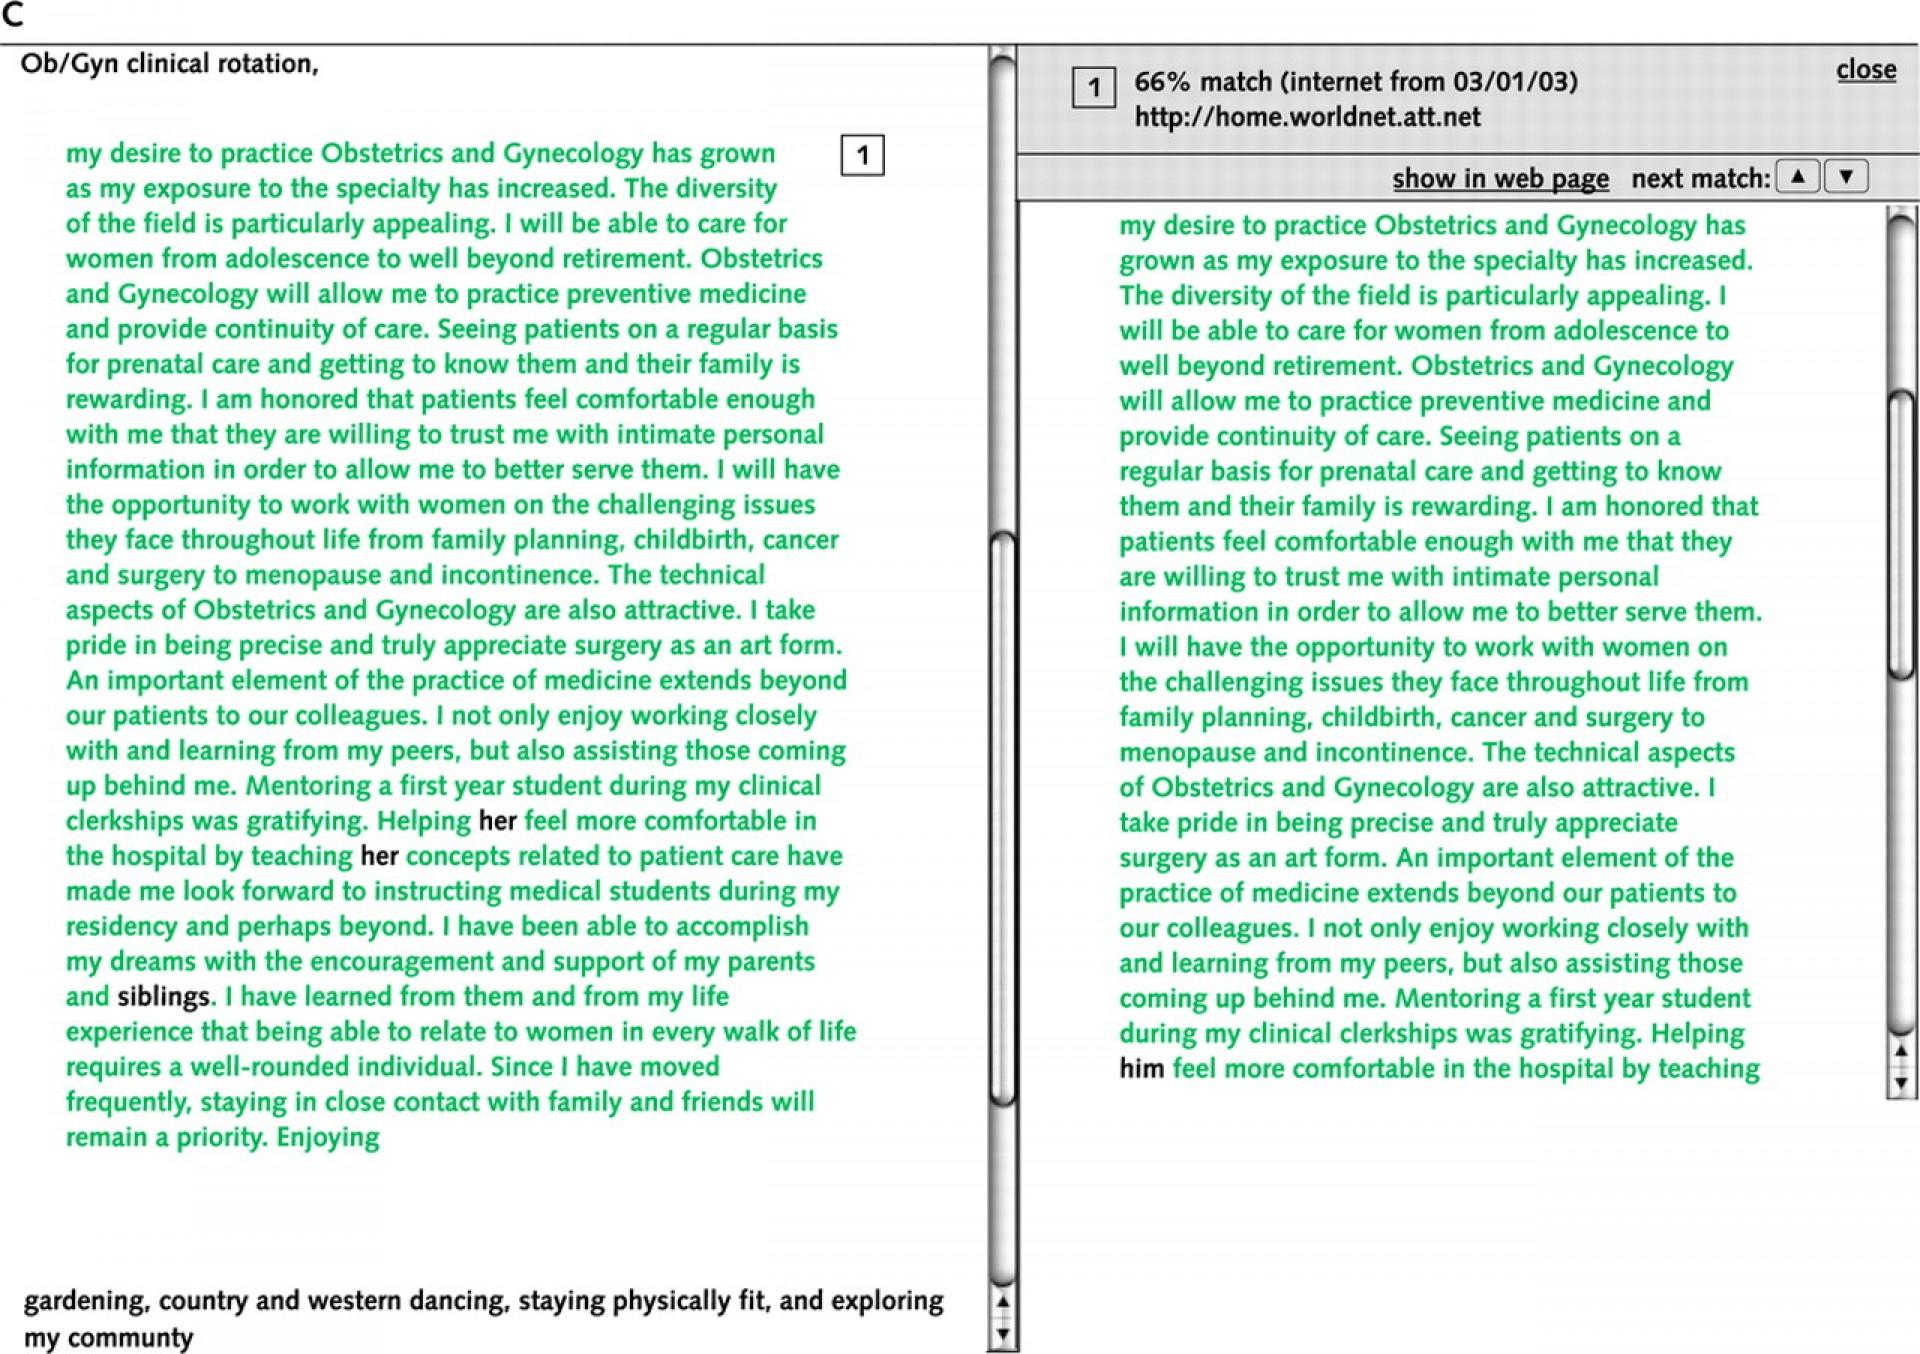 003 Plagiarism Free Essays Essay Impressive 100 Check 1920